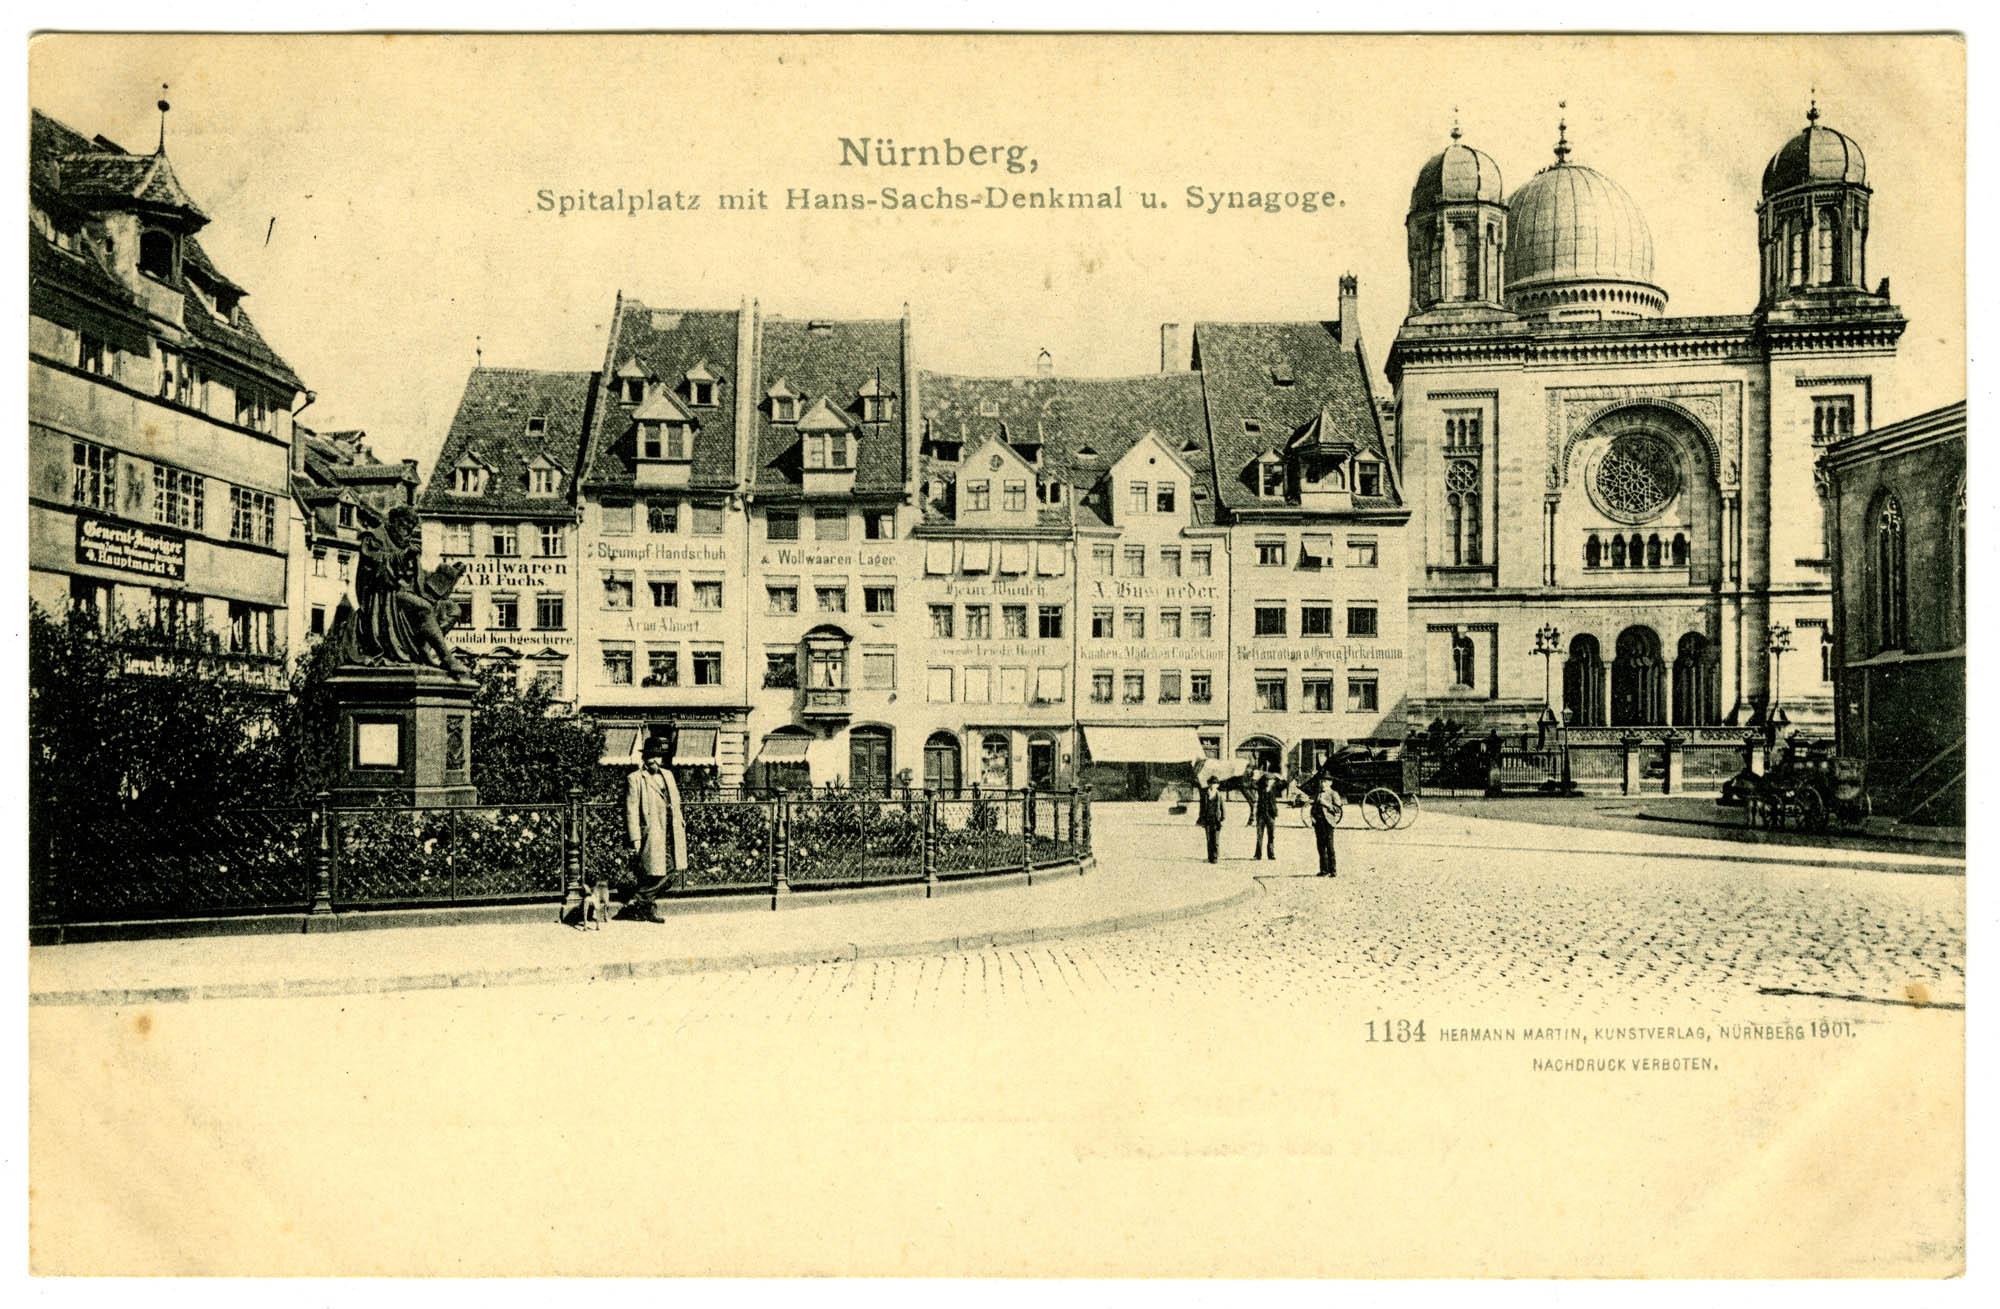 Nürnberg, Spitalplatz mit Hans-Sachs-Denkmal u. Synagoge.